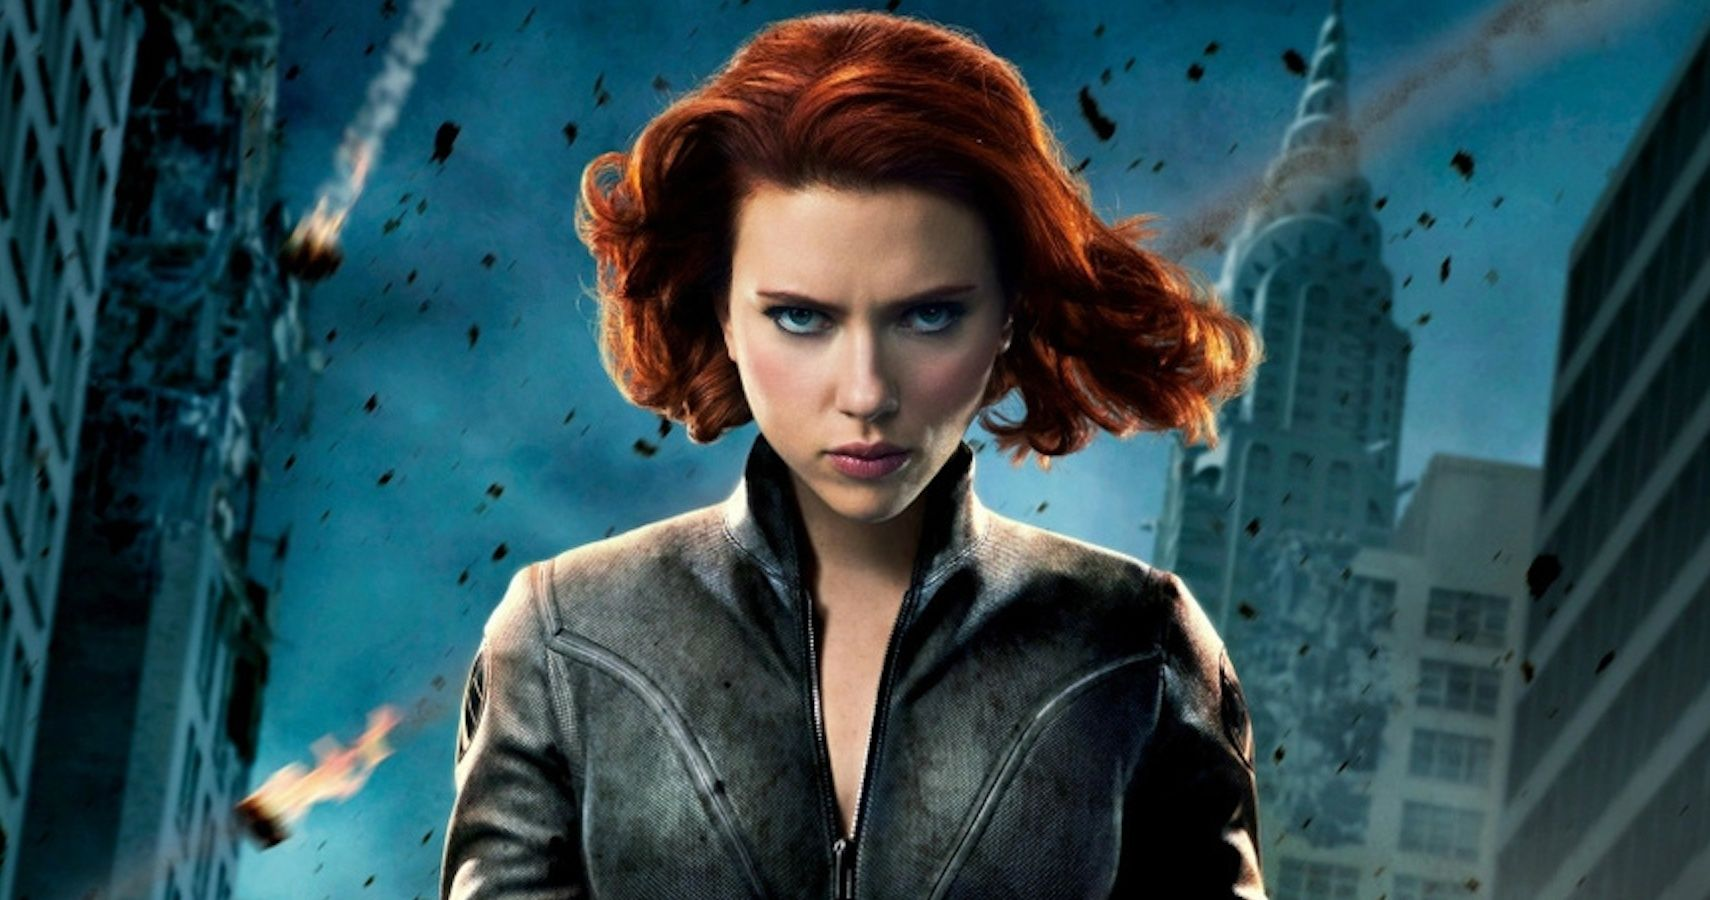 Black Widow 10 Of Natasha Romanoff S Most Memorable Quotes In The Mcu